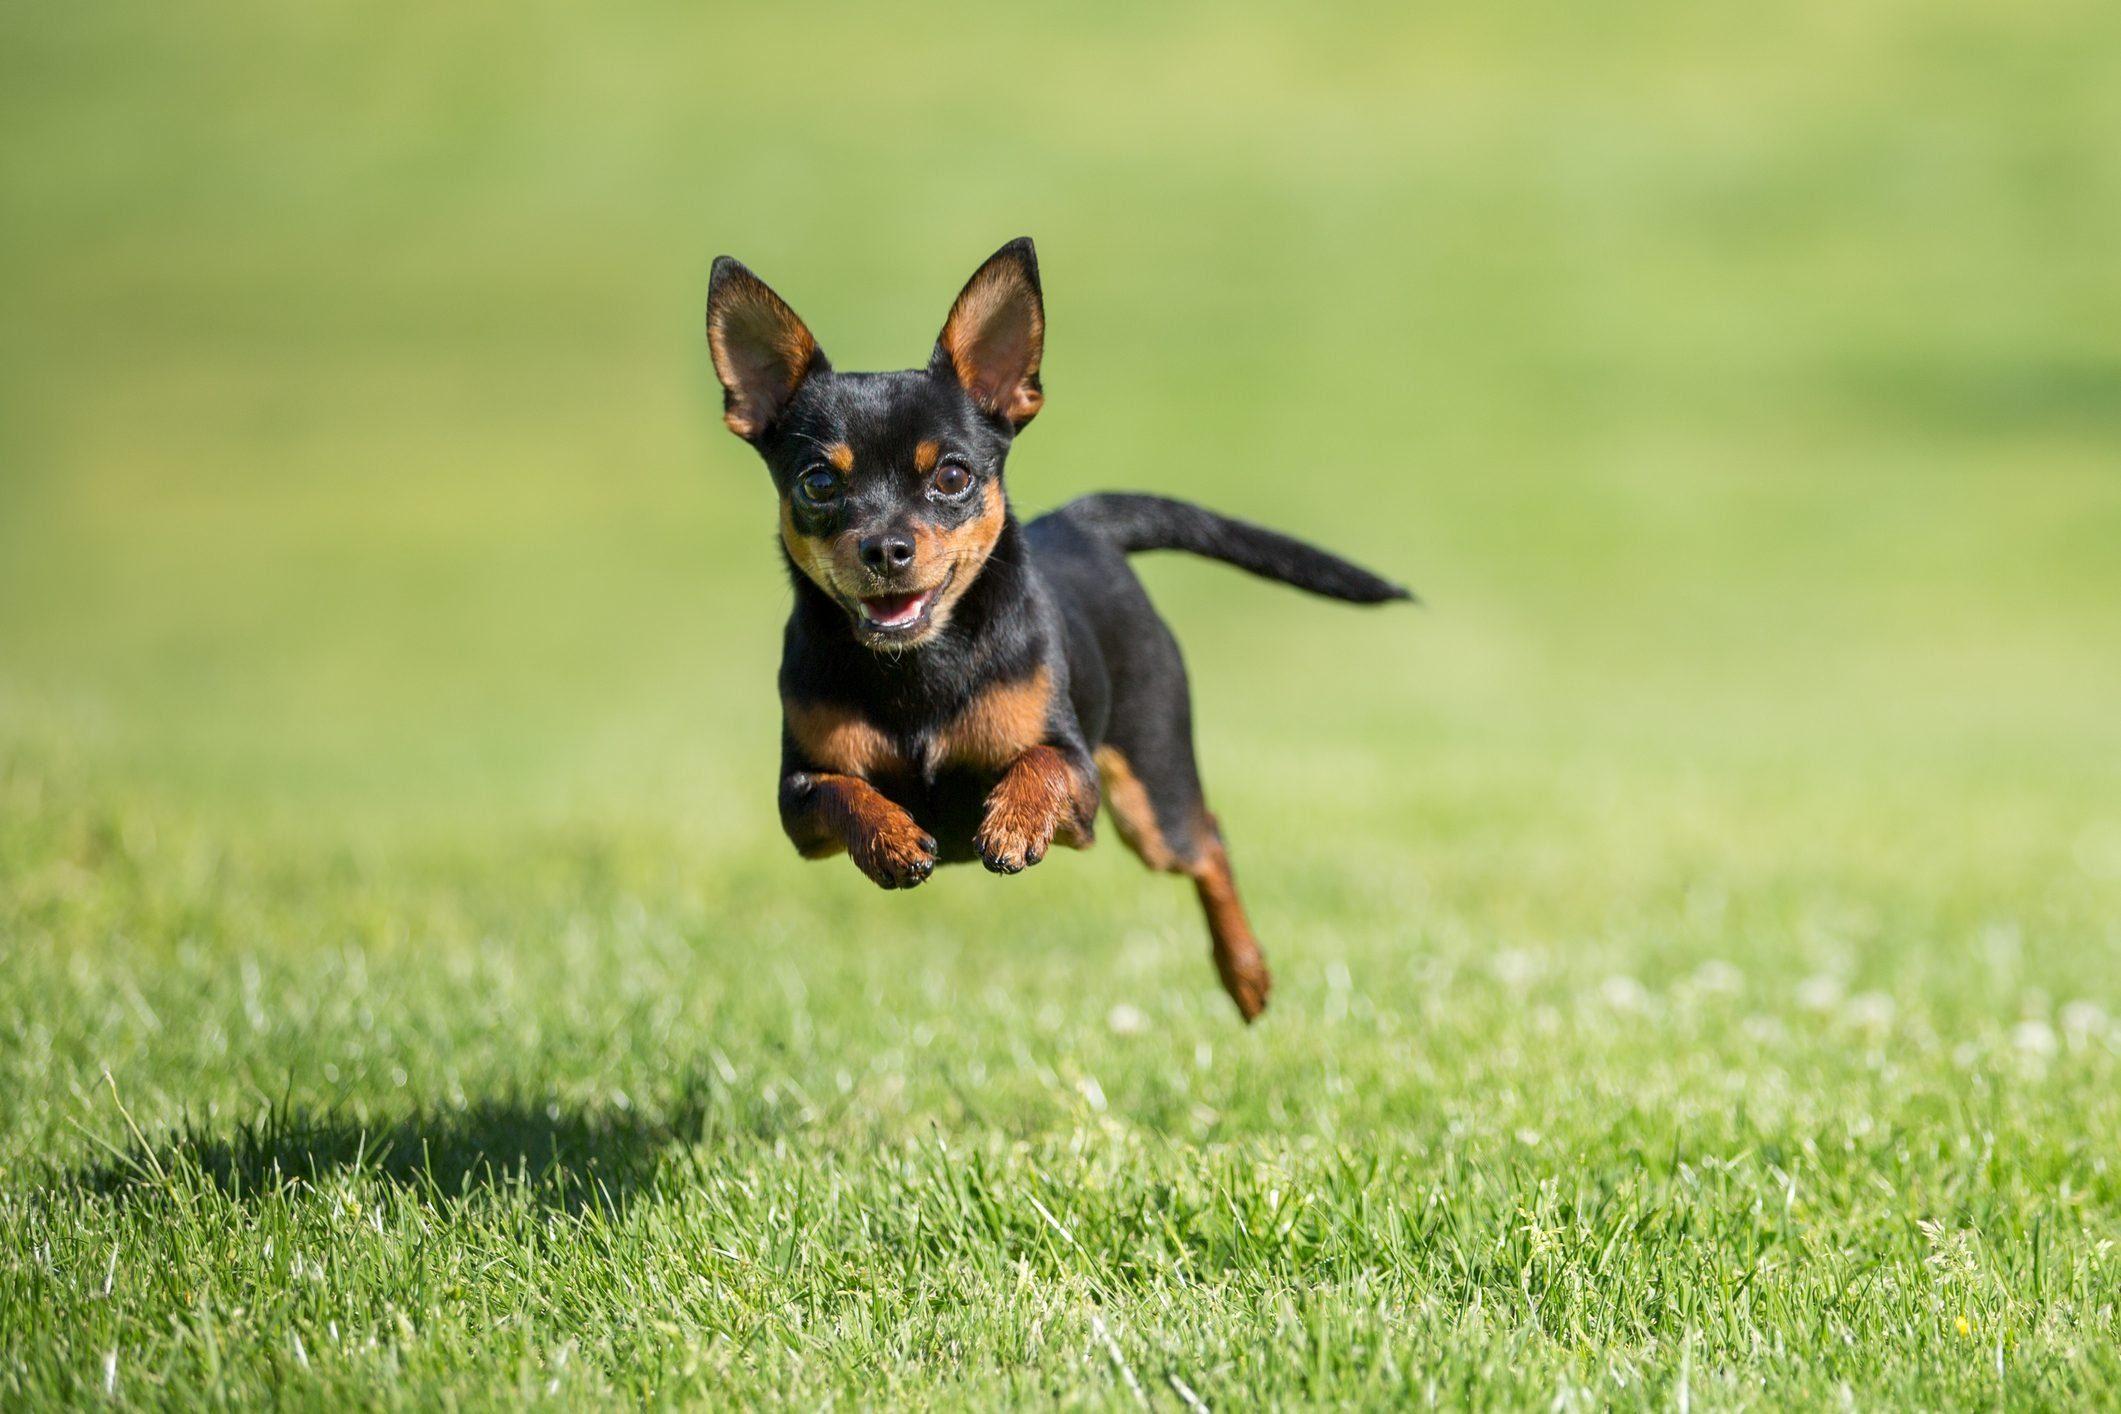 Chihuahua dog running across grass